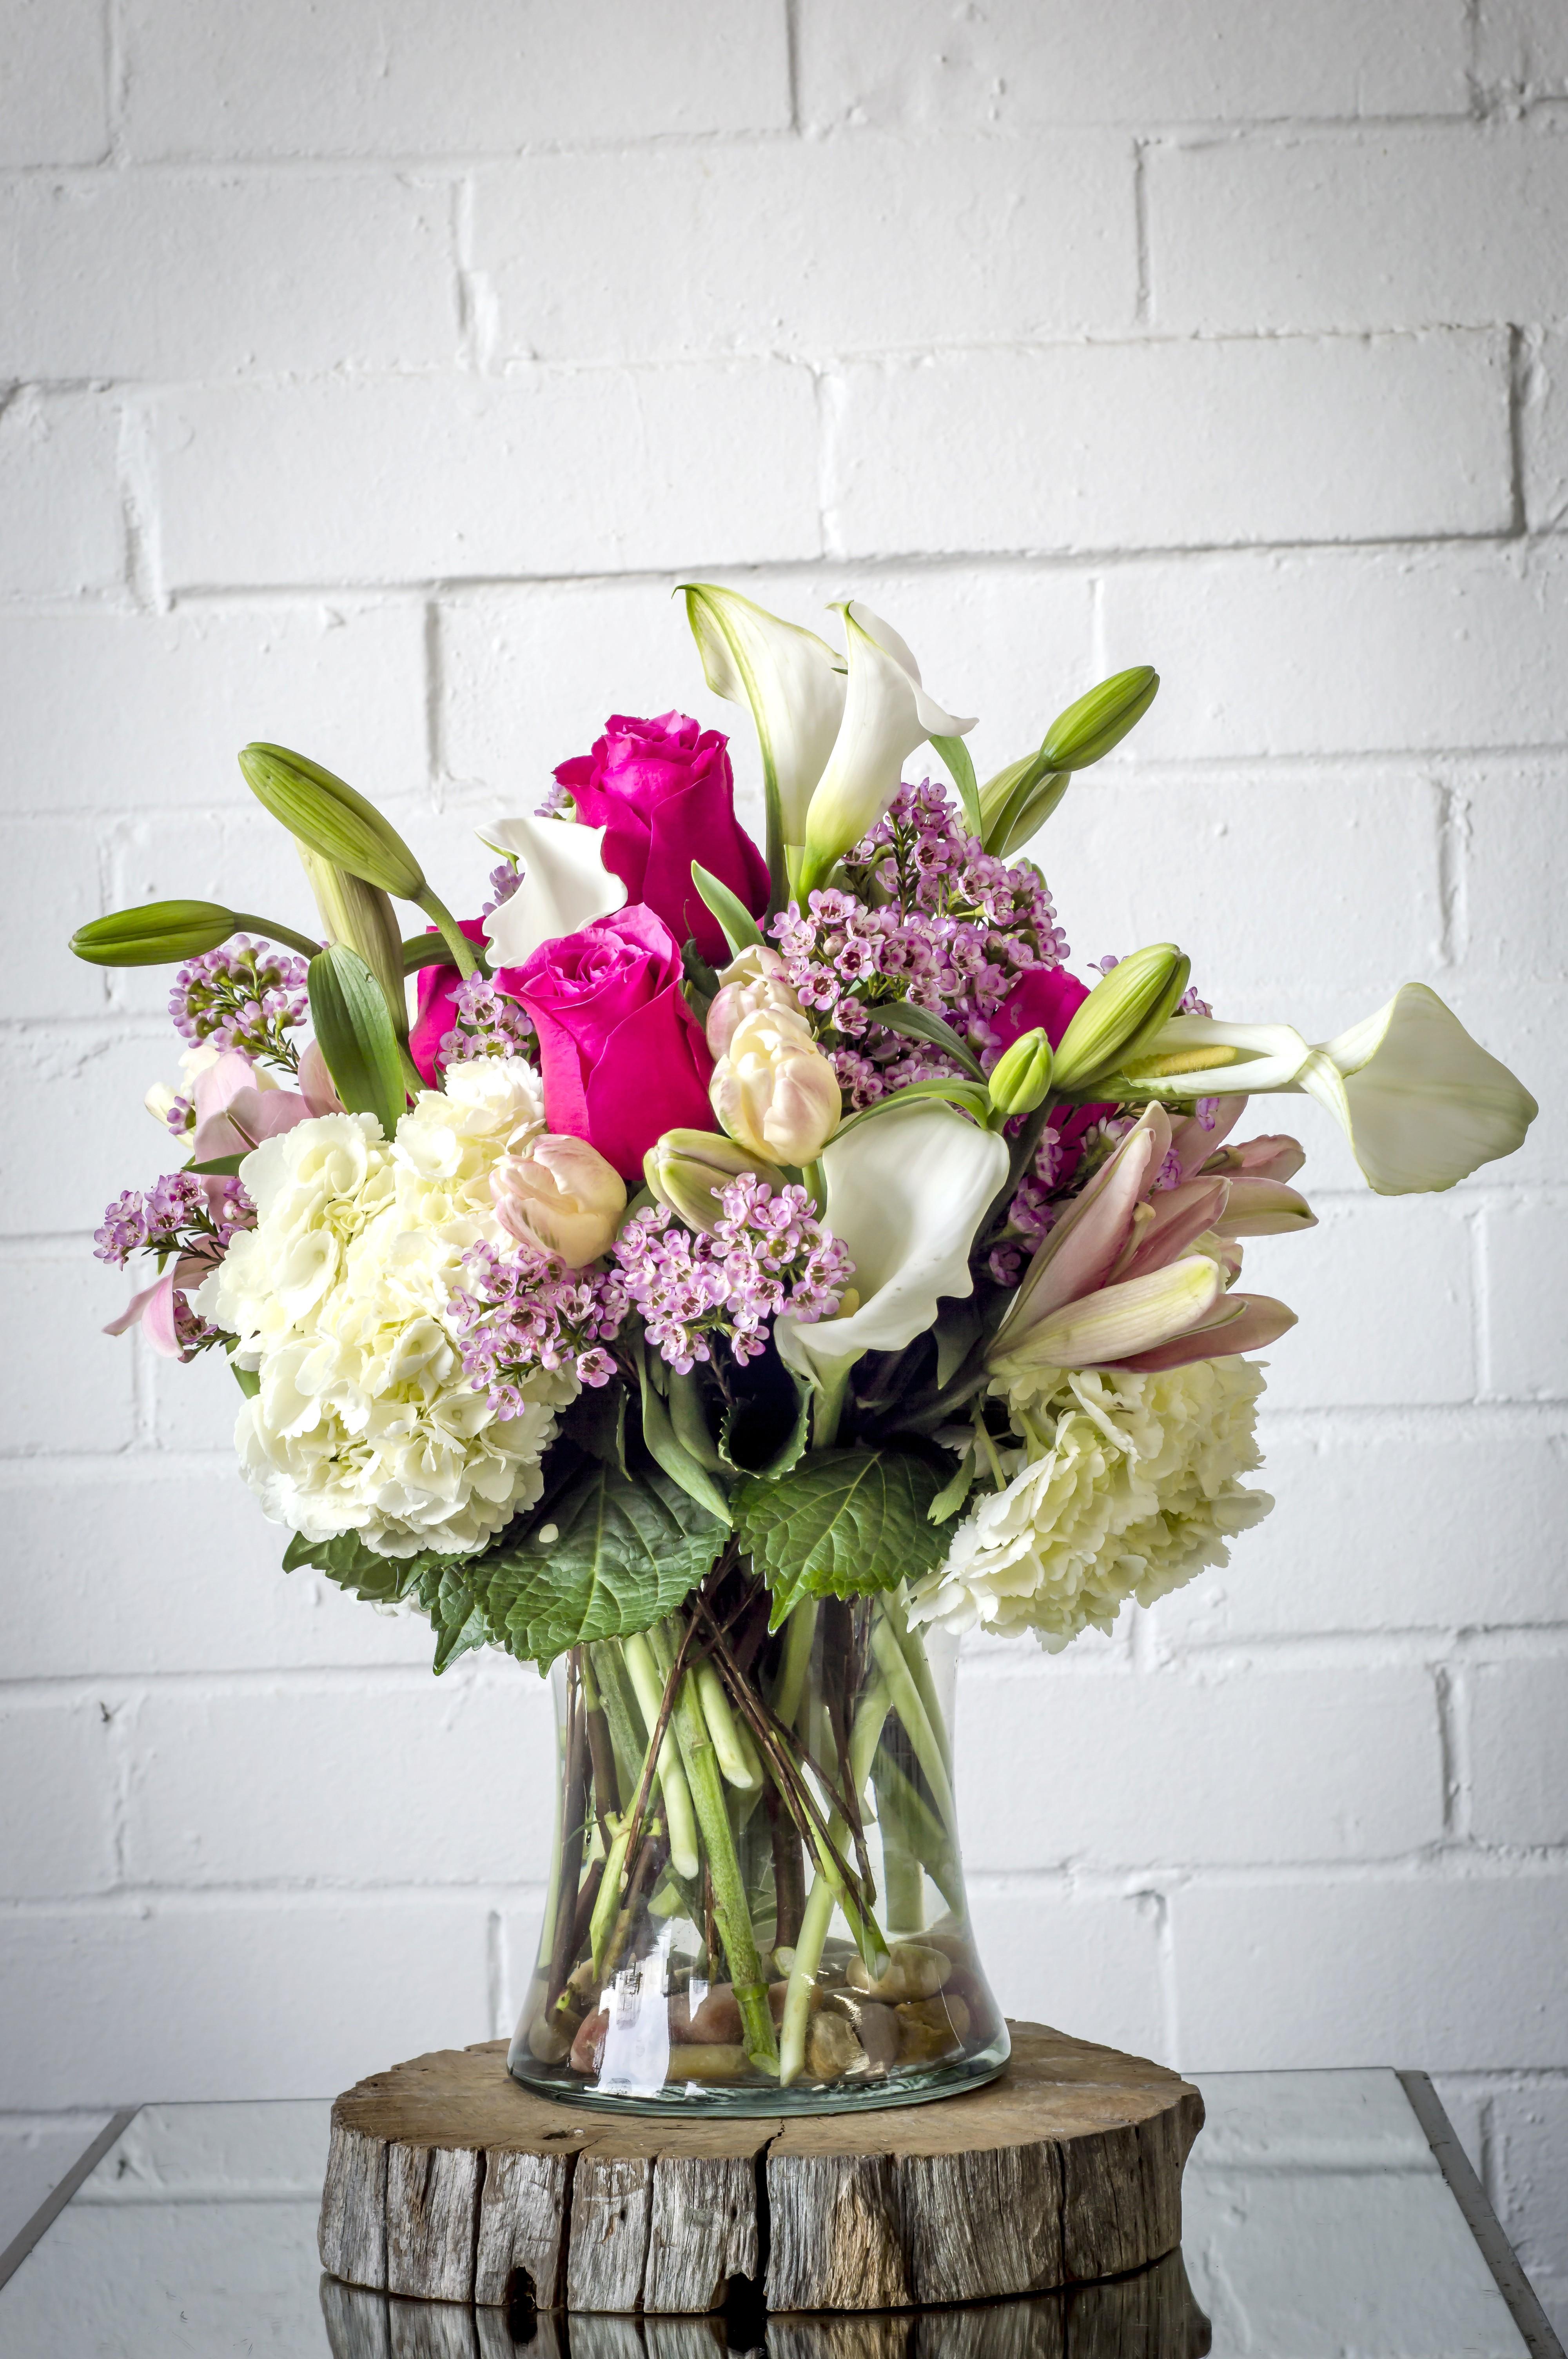 Atlanta Florist   Flower Delivery by Flowering Events/Darryl Wiseman .